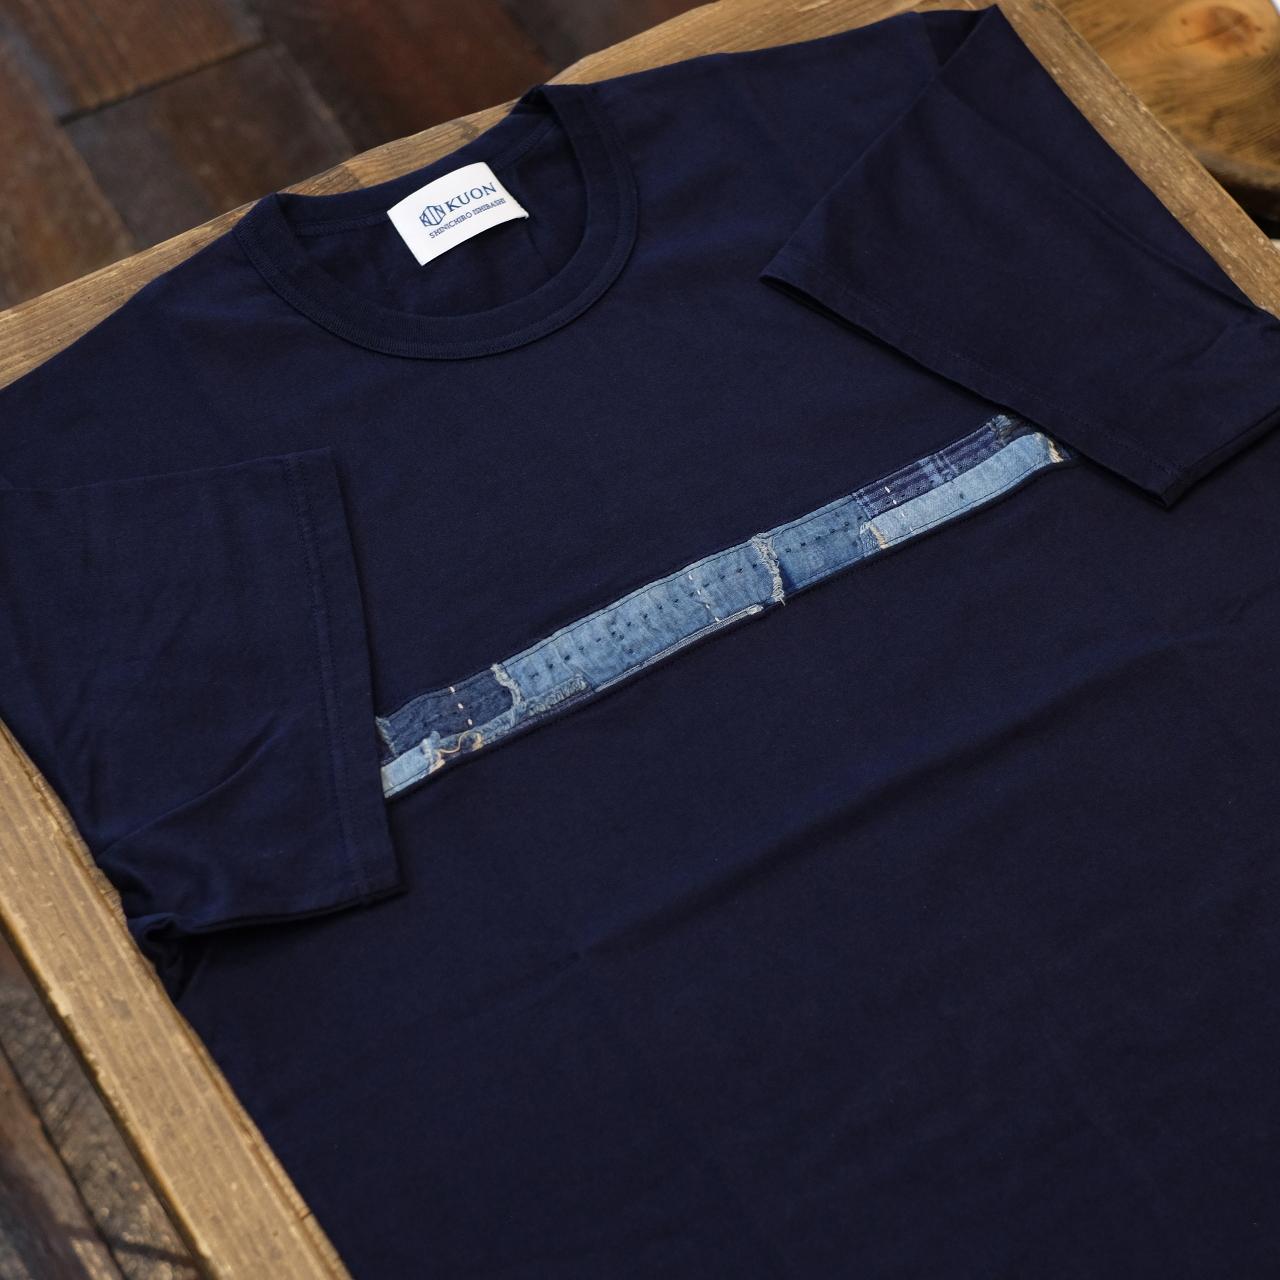 KUON(クオン) アップサイクル襤褸 トリミングTシャツ ネイビー